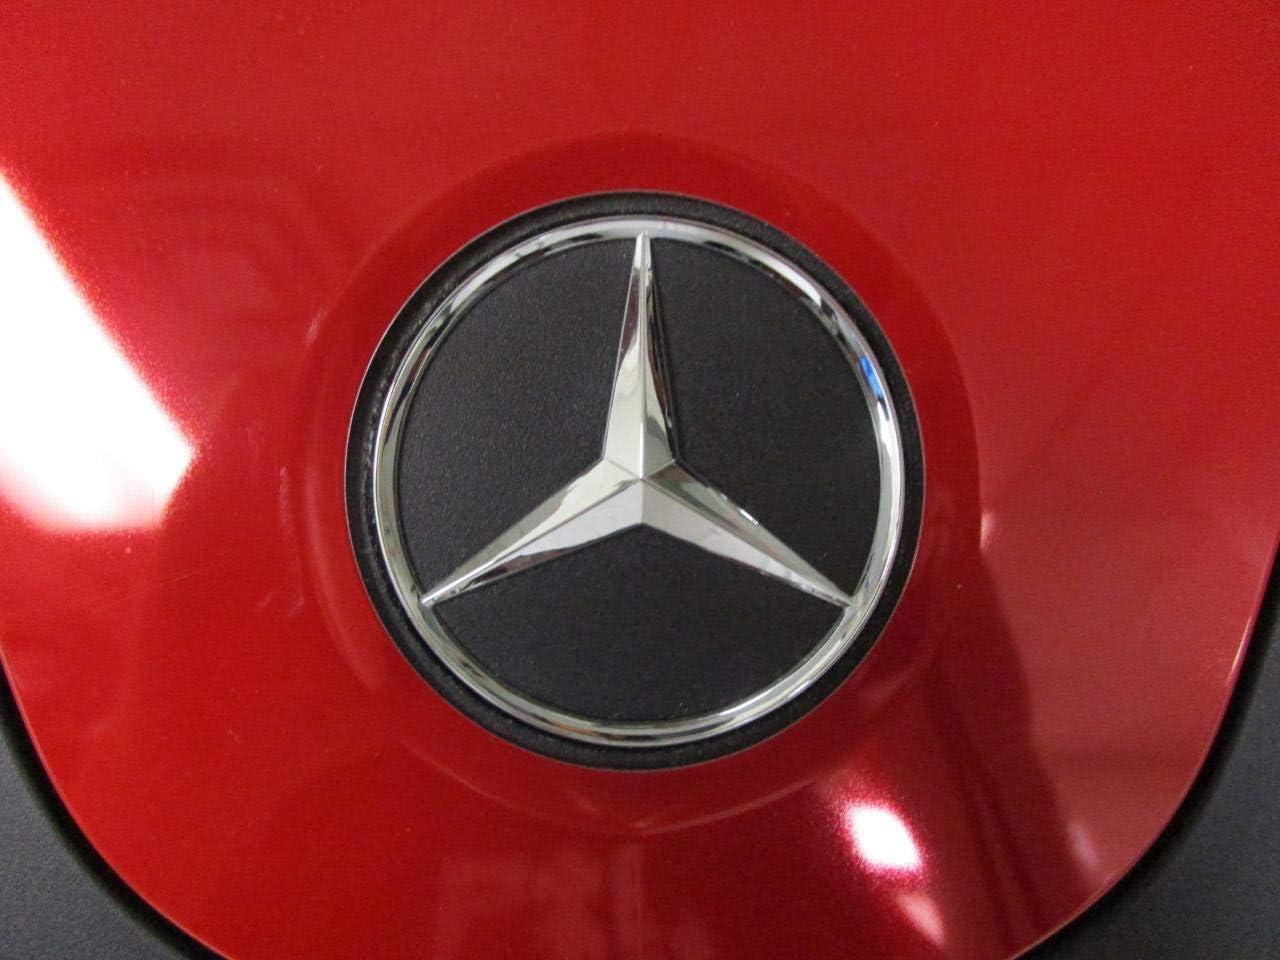 OEM 2015 Mercedes Benz C Class C400 Engine Cover A2760108612